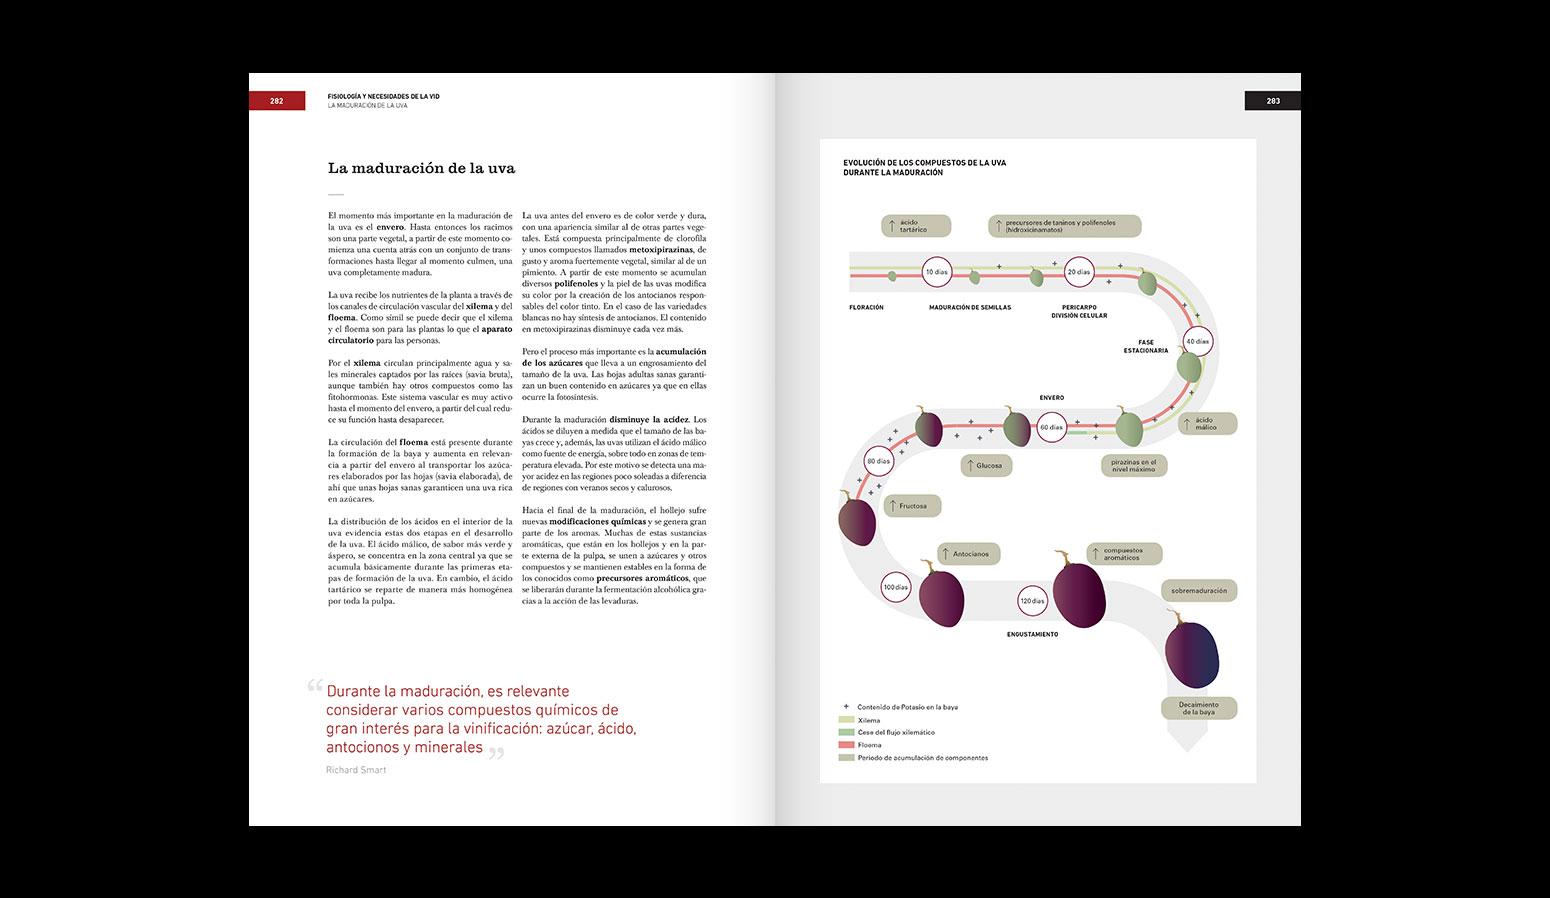 Diseño del libro de Vinos para Bullipedia - Ferran Adrià, elBullifoundation